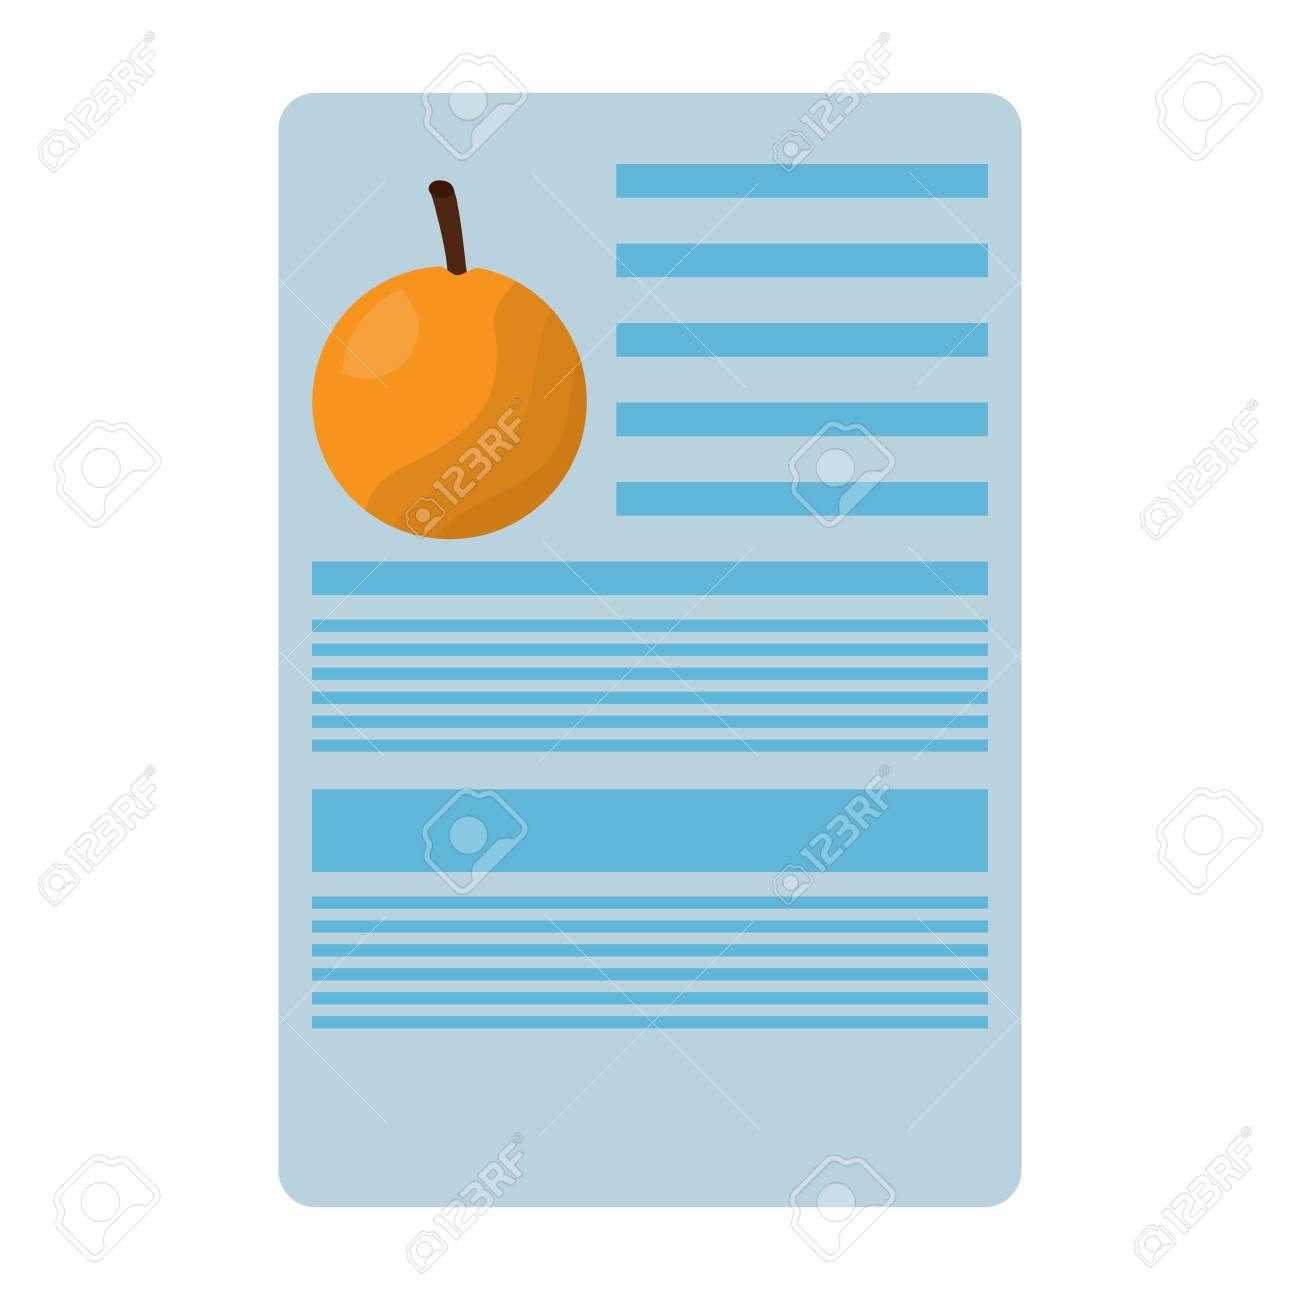 orange nutrition facts label template vector illustration royalty